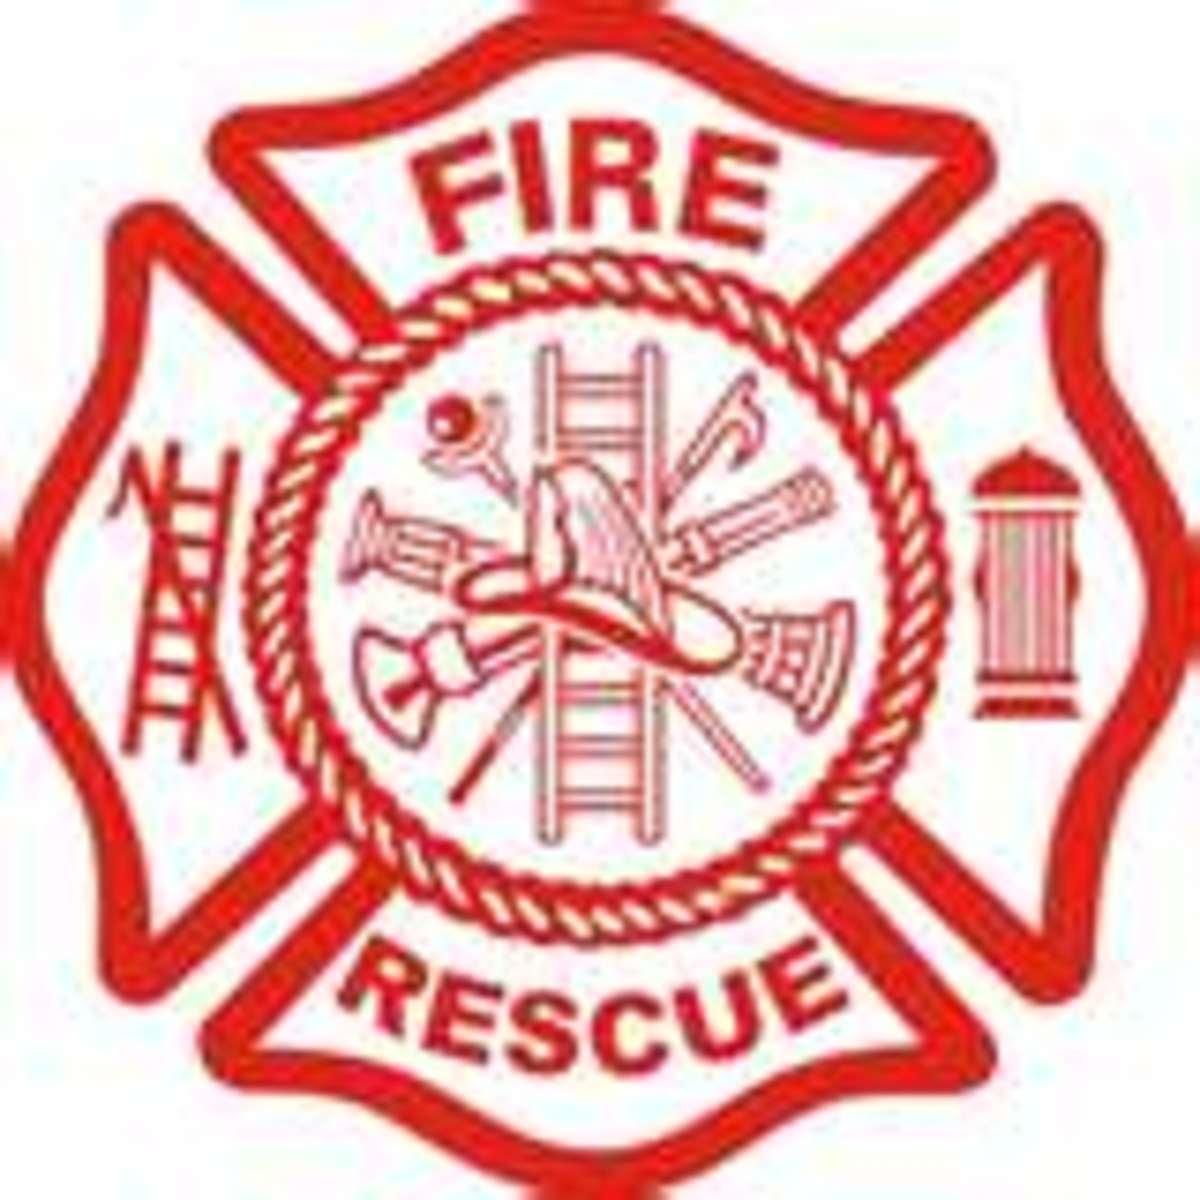 Let's Talk Fire: Backdraft, A Firefighter Nightmare